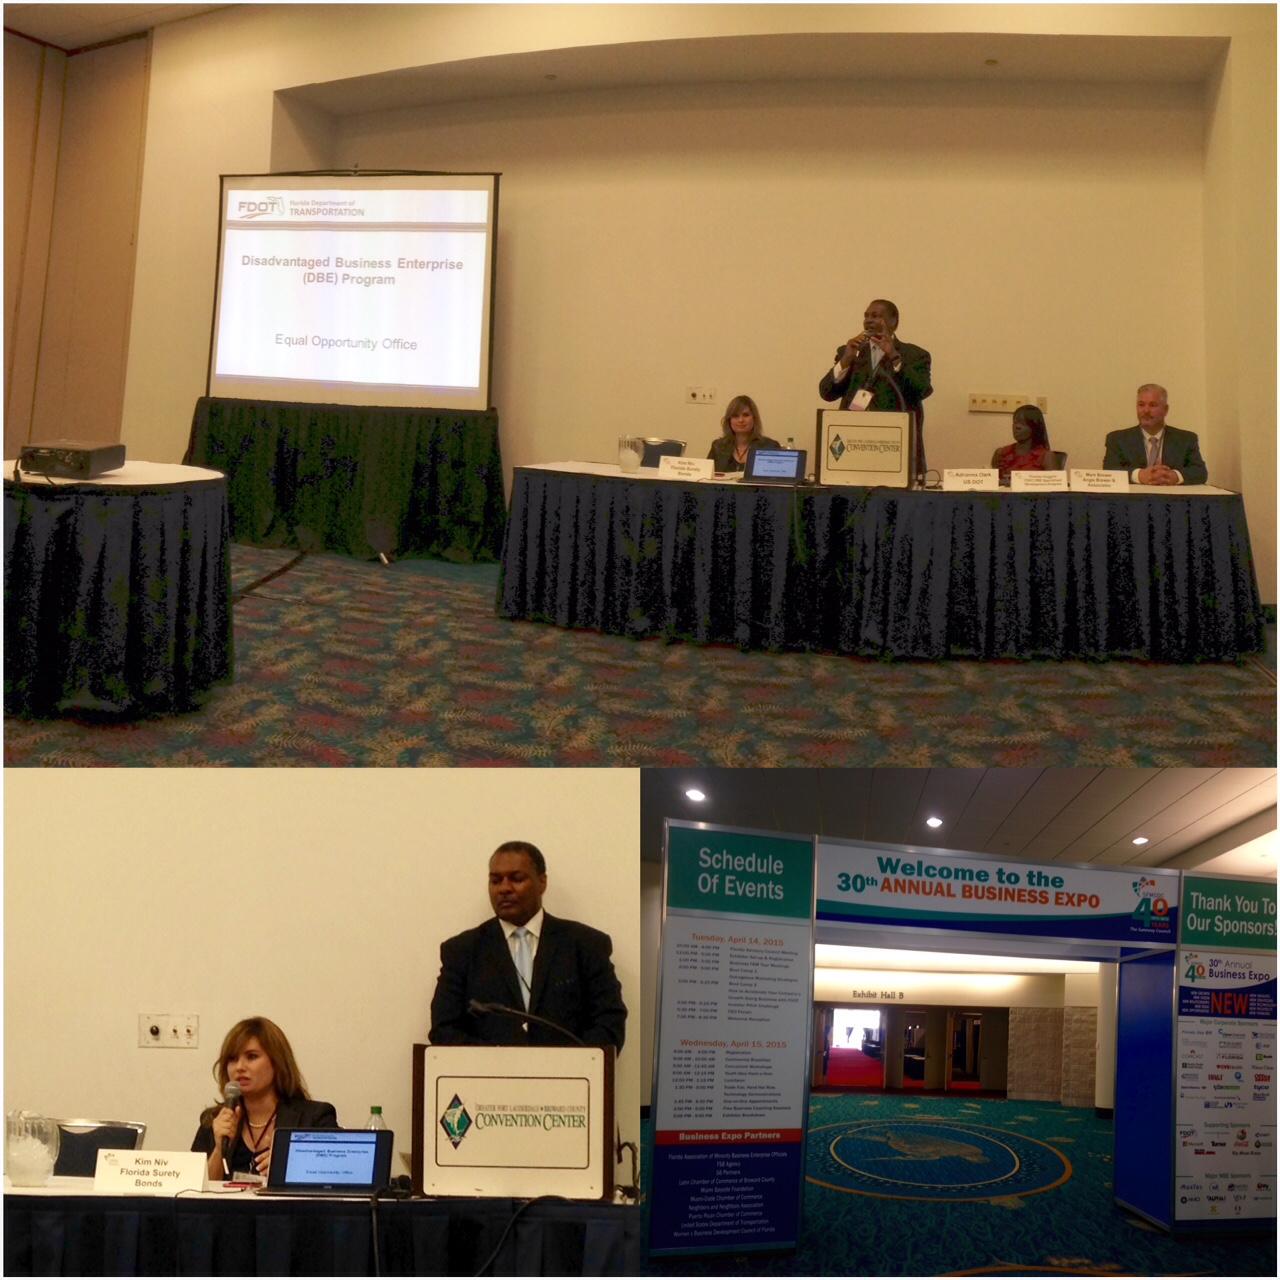 SFMSDC 30th Annual Business Expo - Florida Surety Bonds